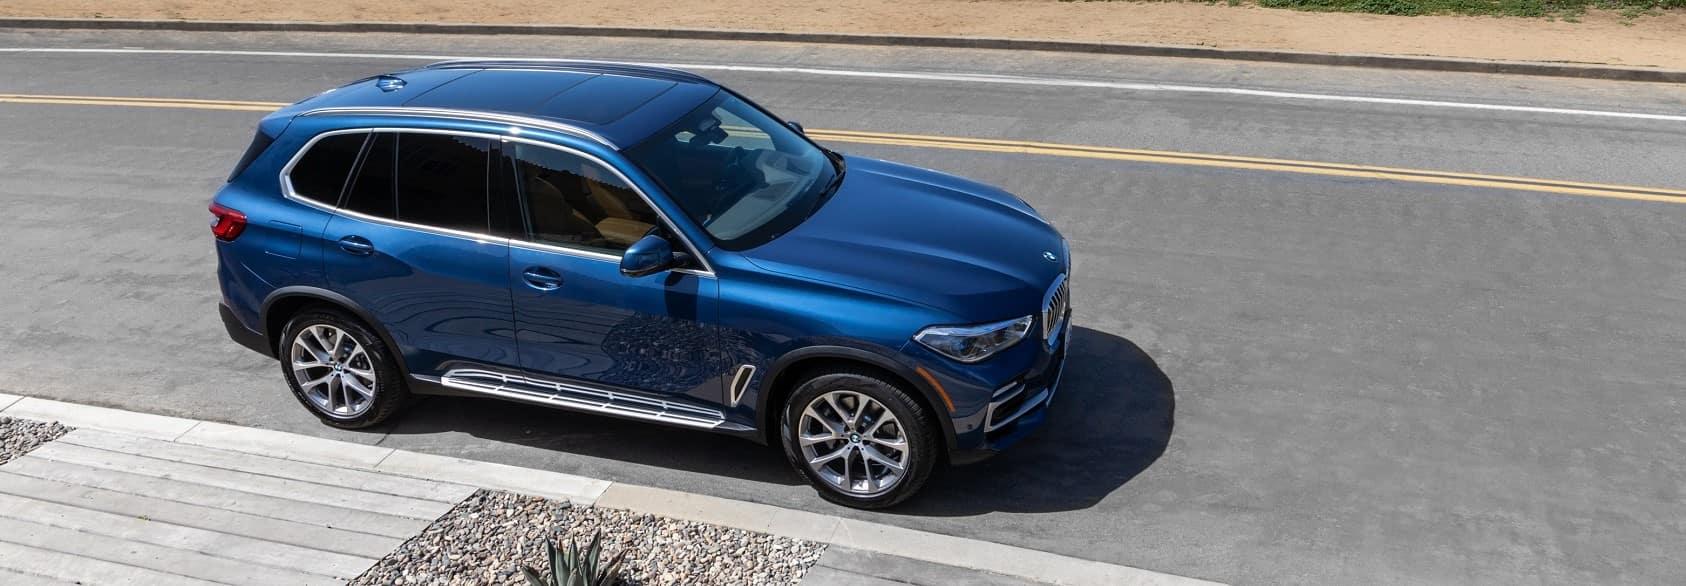 2020 BMW X5 Arlington TX